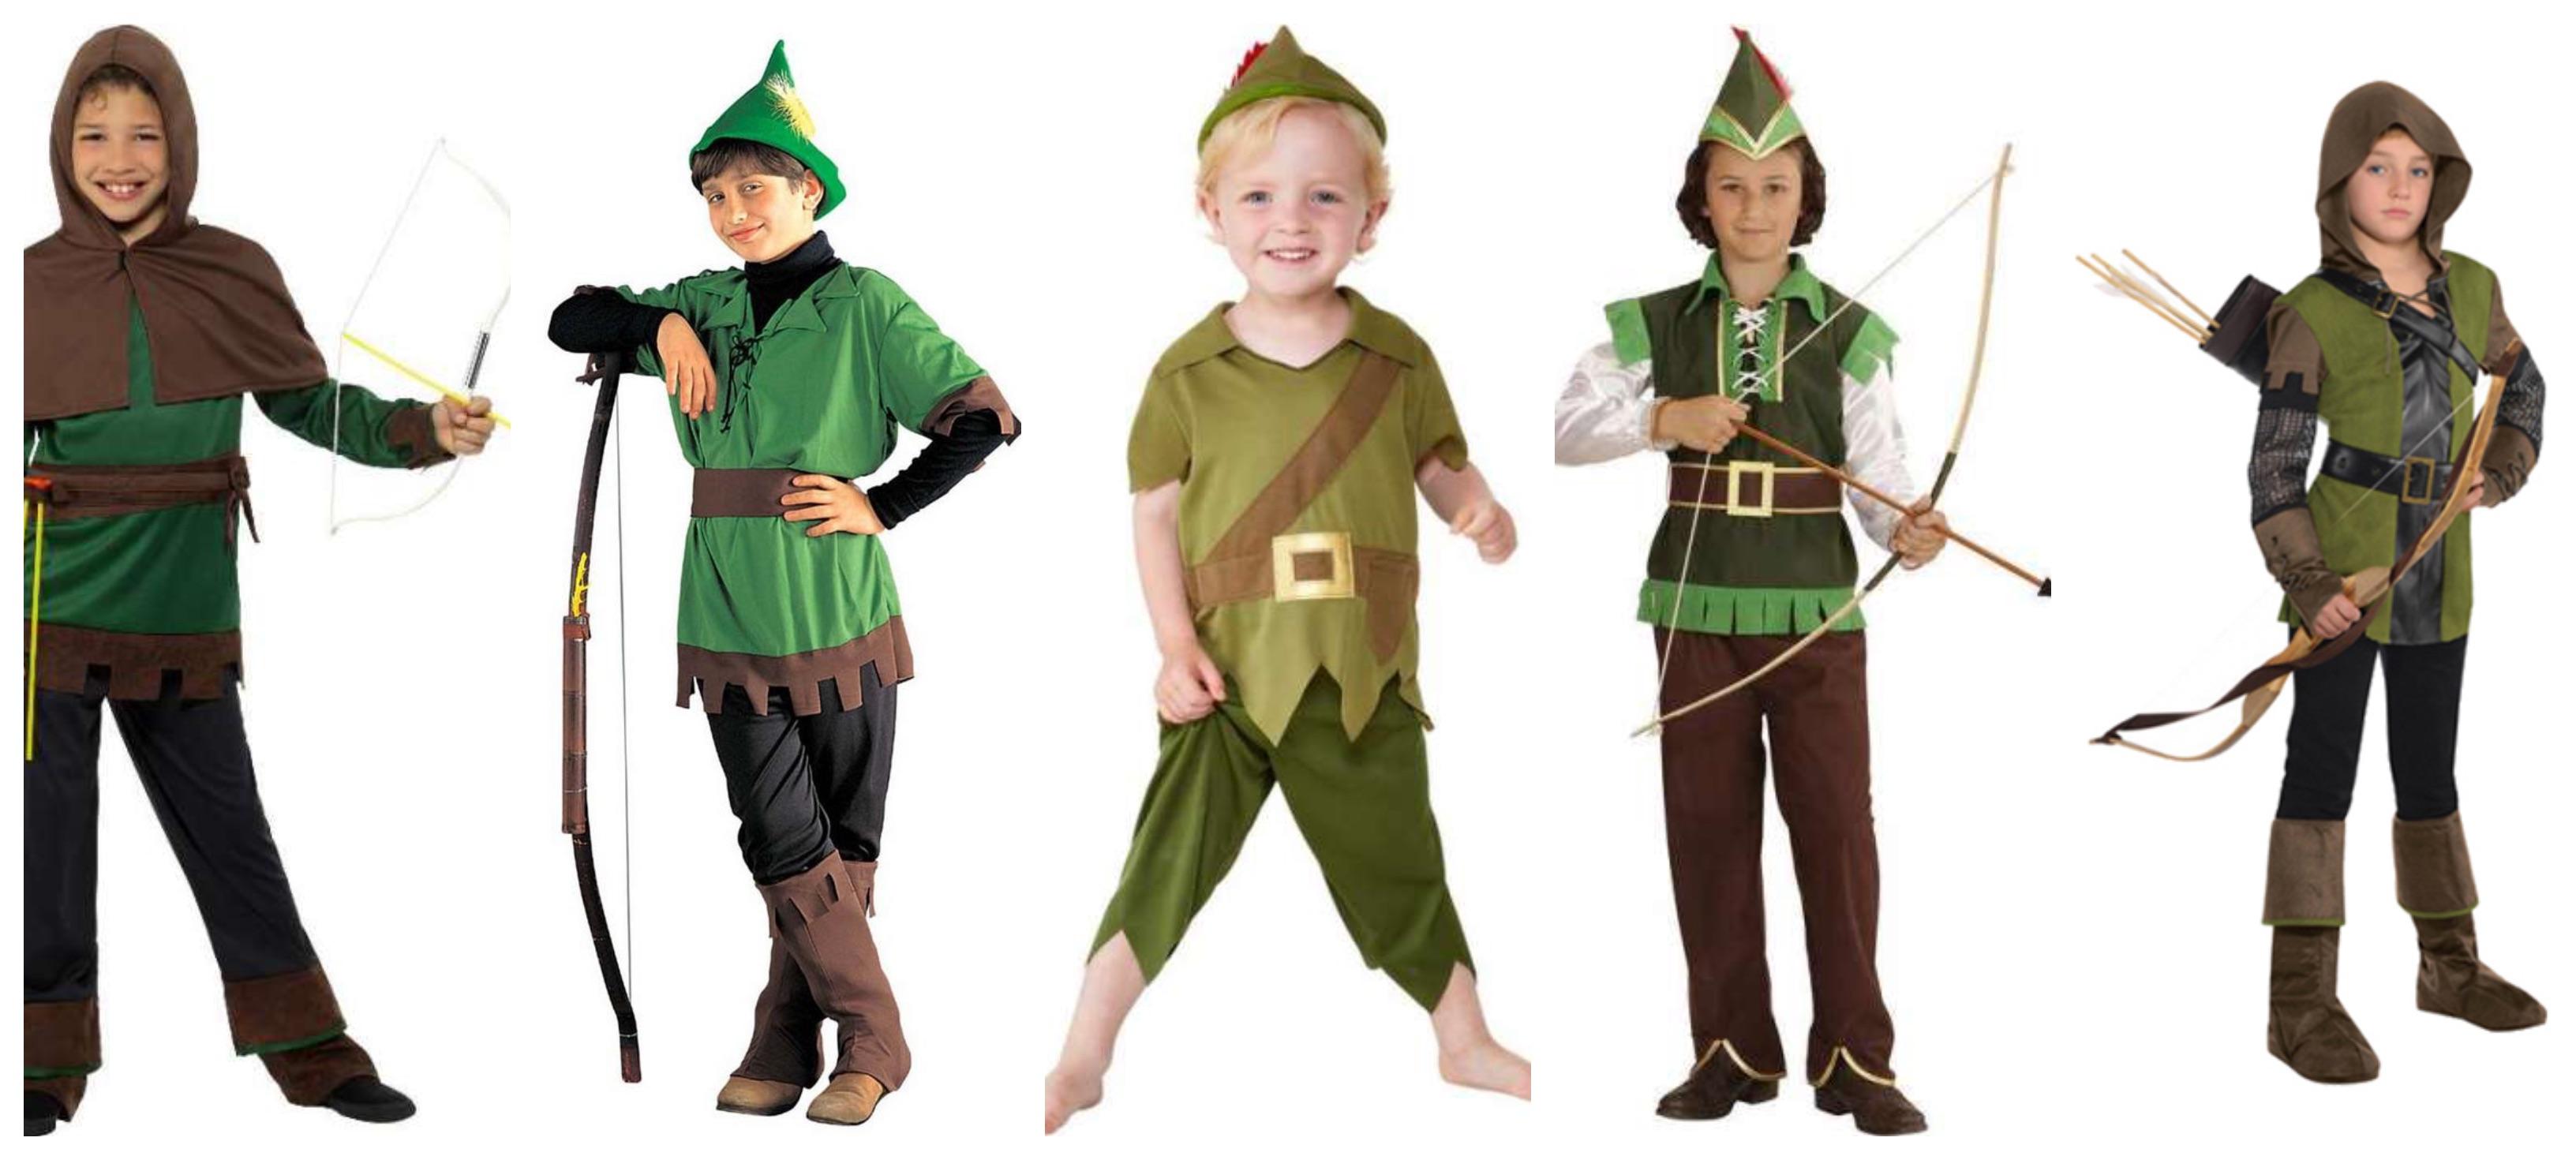 robin hood kostume 1 - Robin Hood kostume til børn og baby